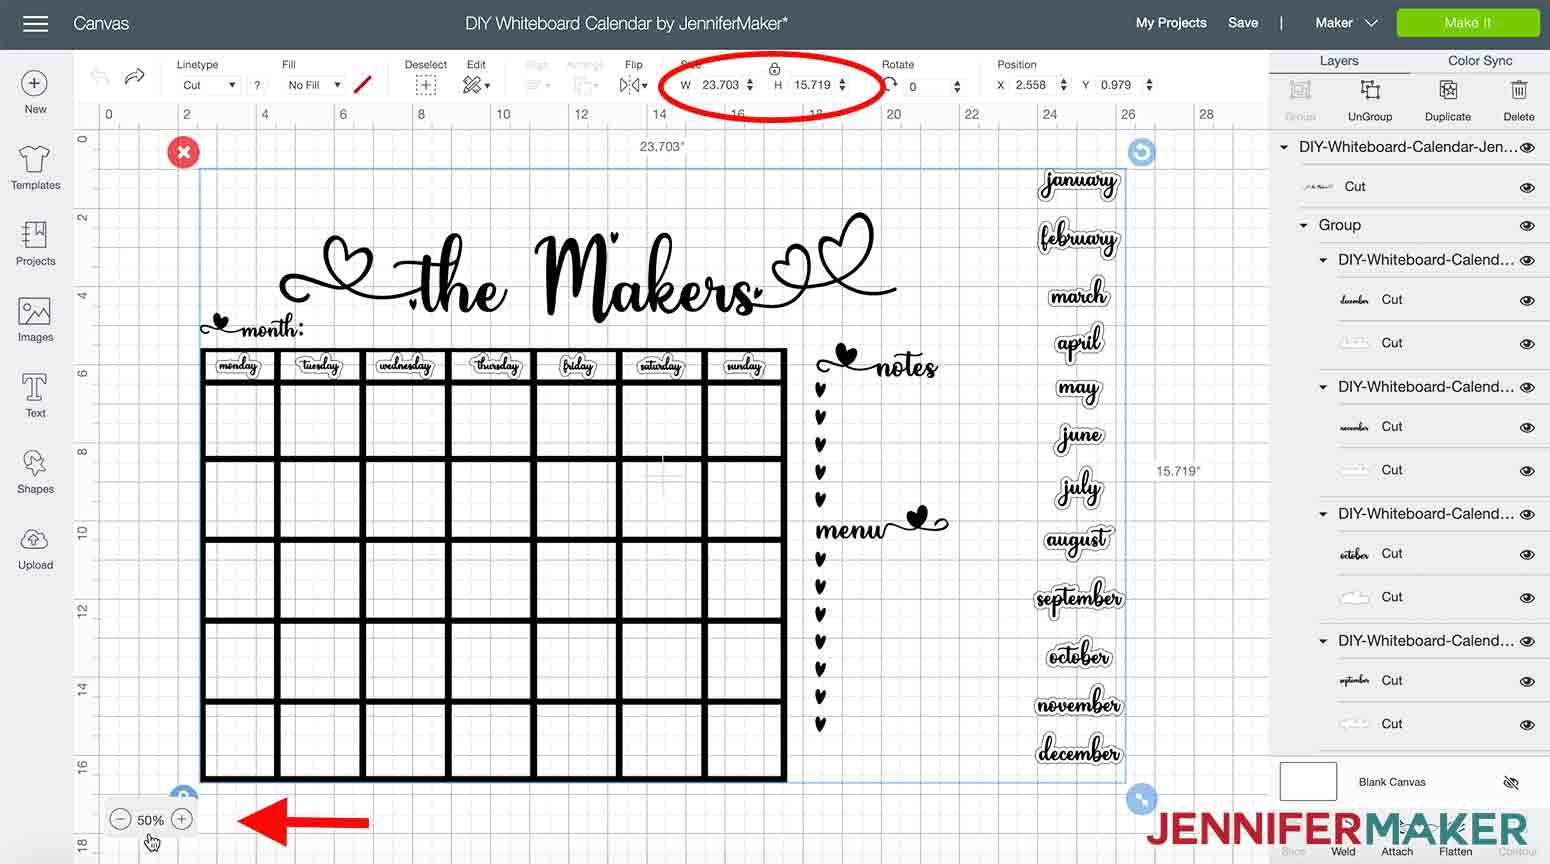 DIY-Whiteboard-Calendar-JenniferMaker-Design-Space